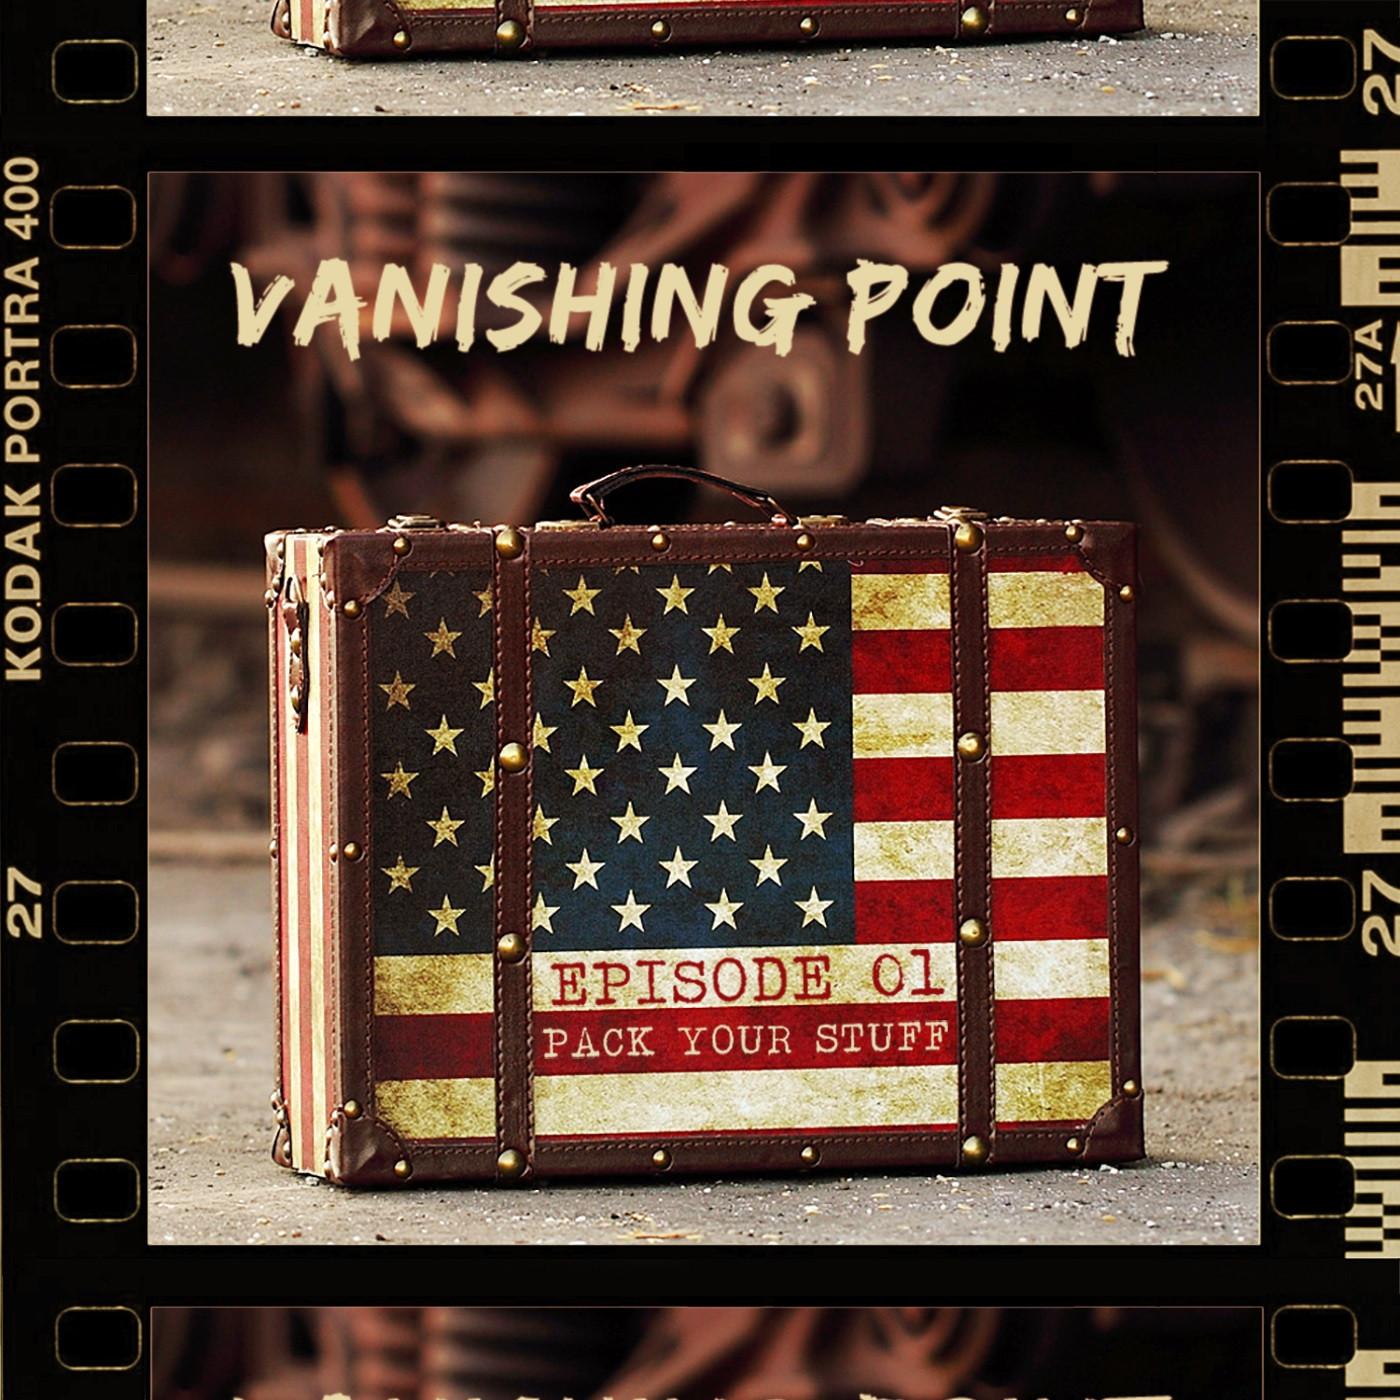 VANISHING POINT #1 - Pack your stuff !